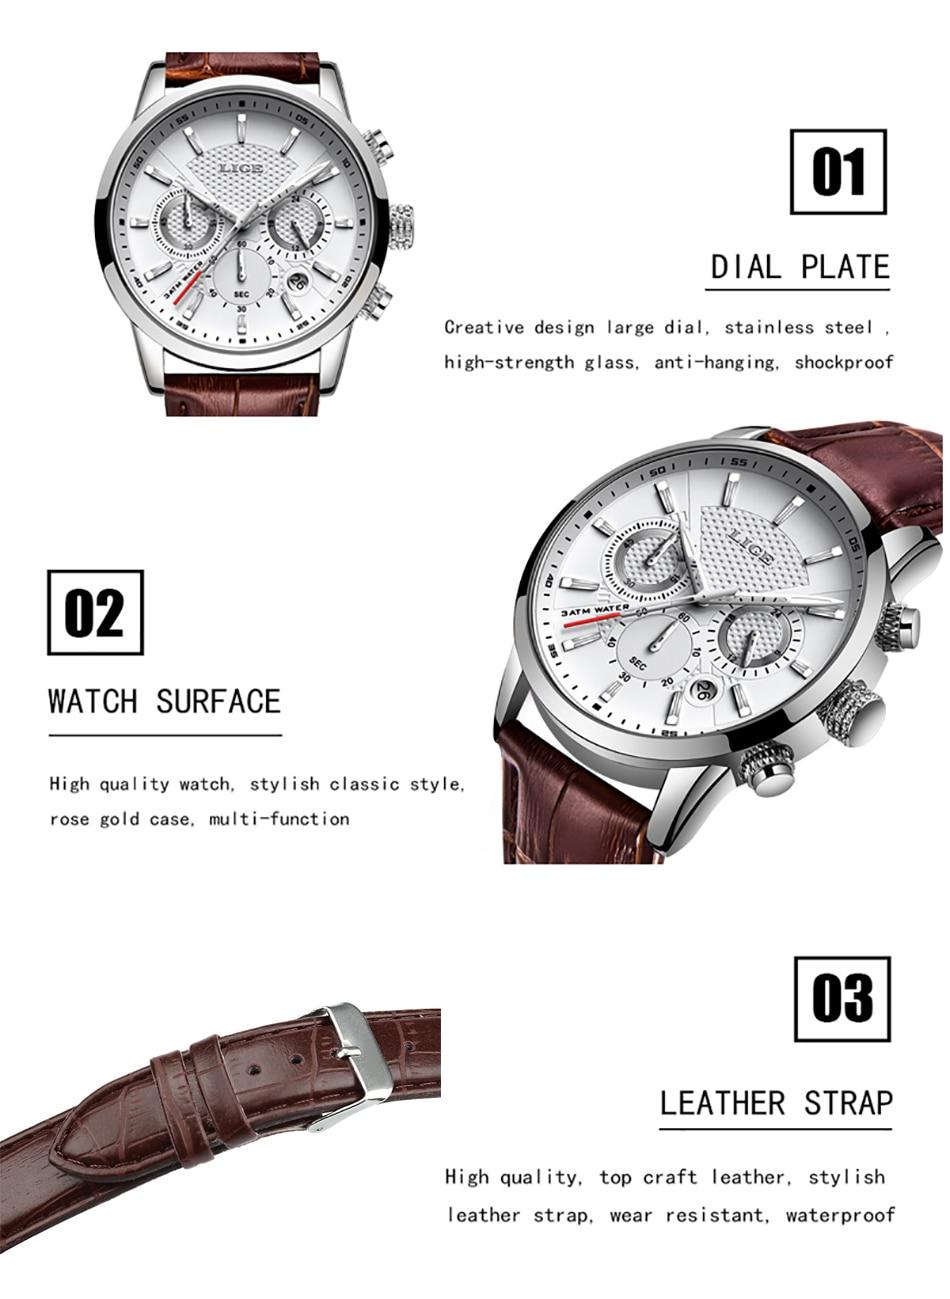 HTB19qm0aSSD3KVjSZFKq6z10VXaW LIGE 2020 New Watch Men Fashion Sport Quartz Clock Mens Watches Brand Luxury Leather Business Waterproof Watch Relogio Masculino